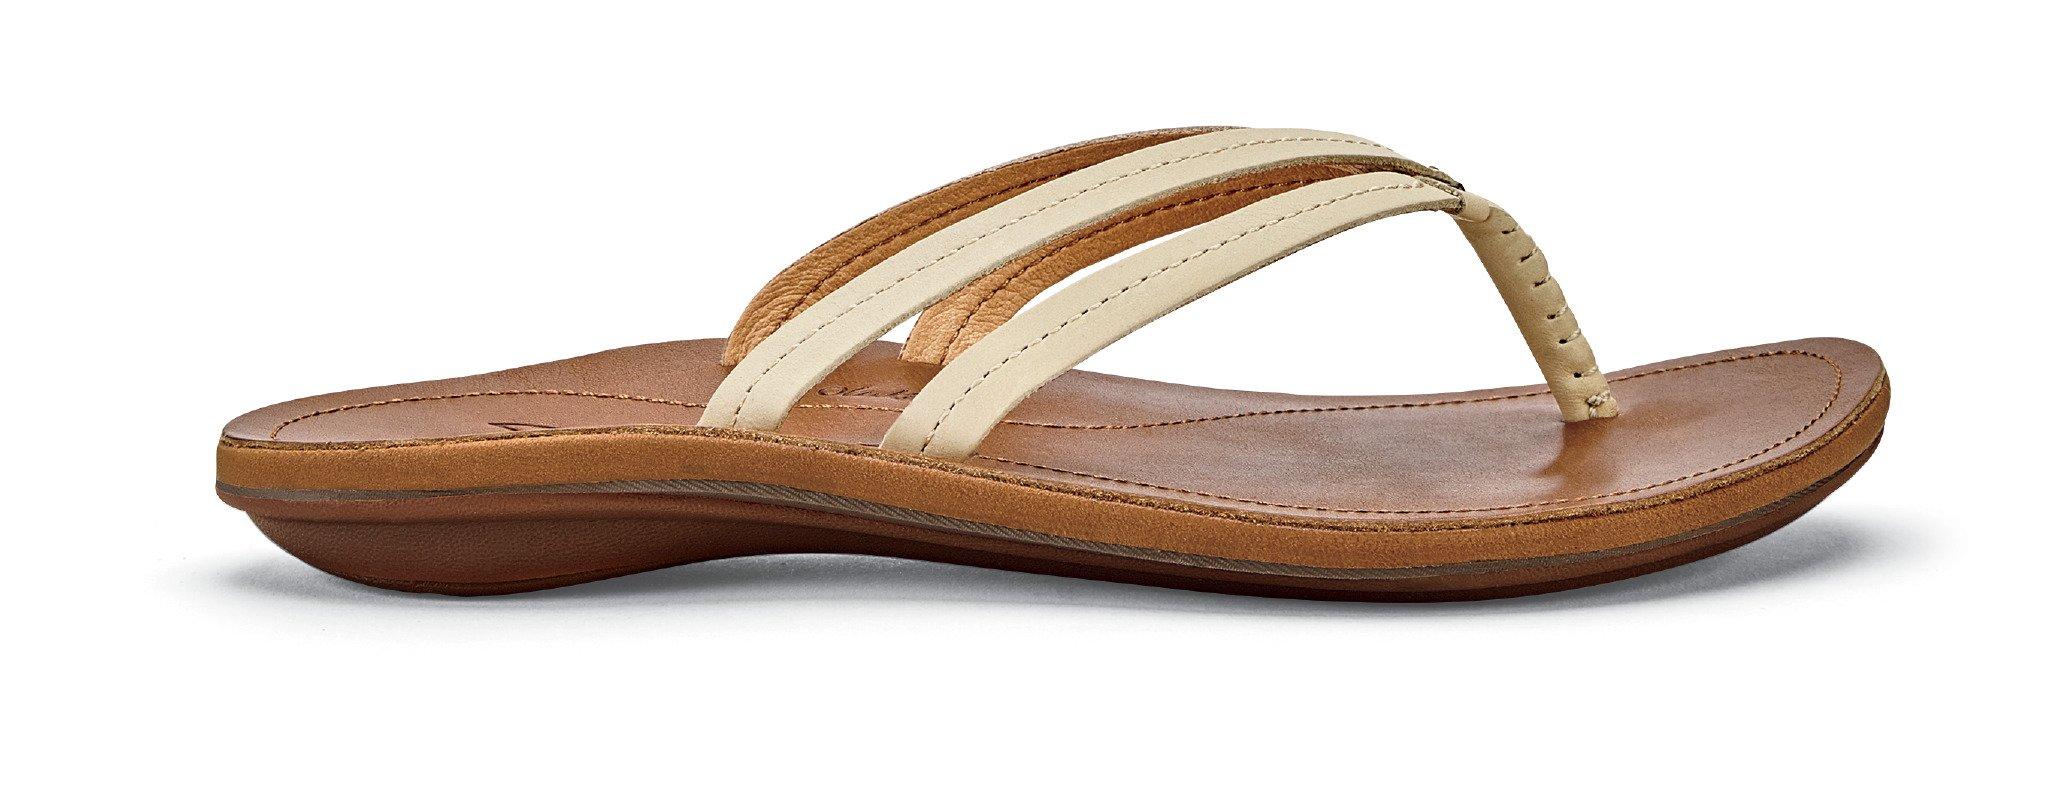 OLUKAI U'I Sandals - Women's Tapa/Sahara 9